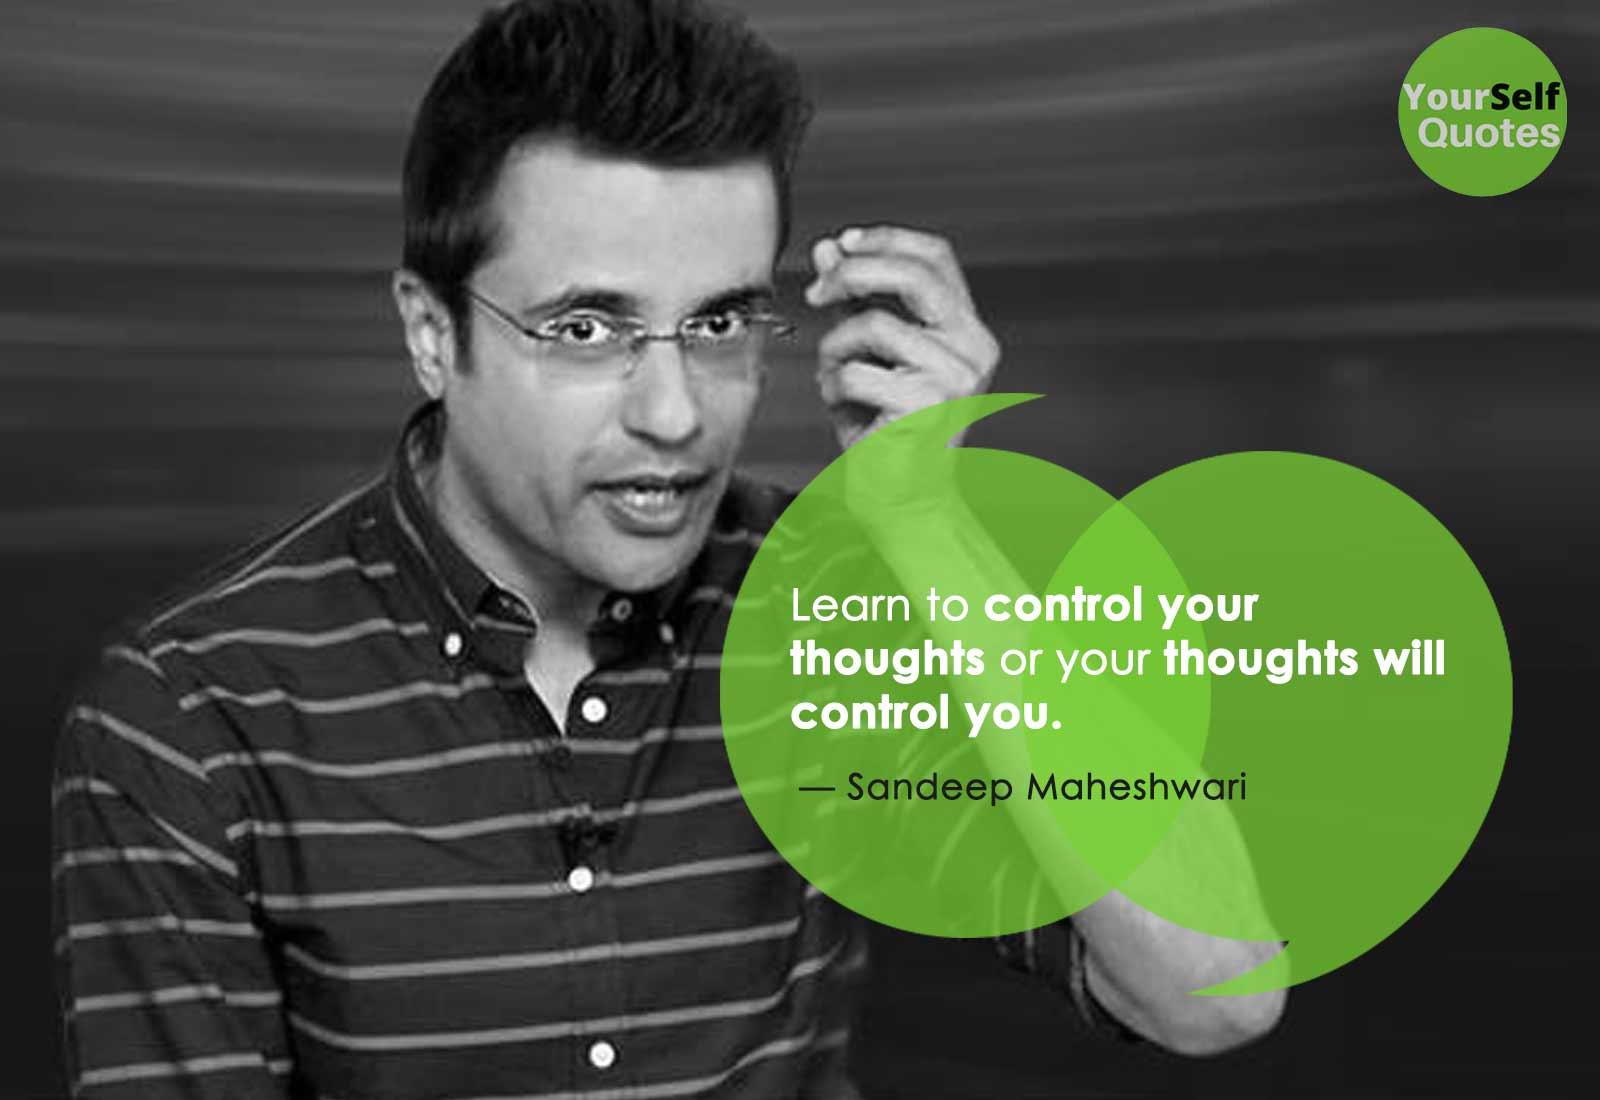 Sandeep Maheshwari Thoughts Quotes